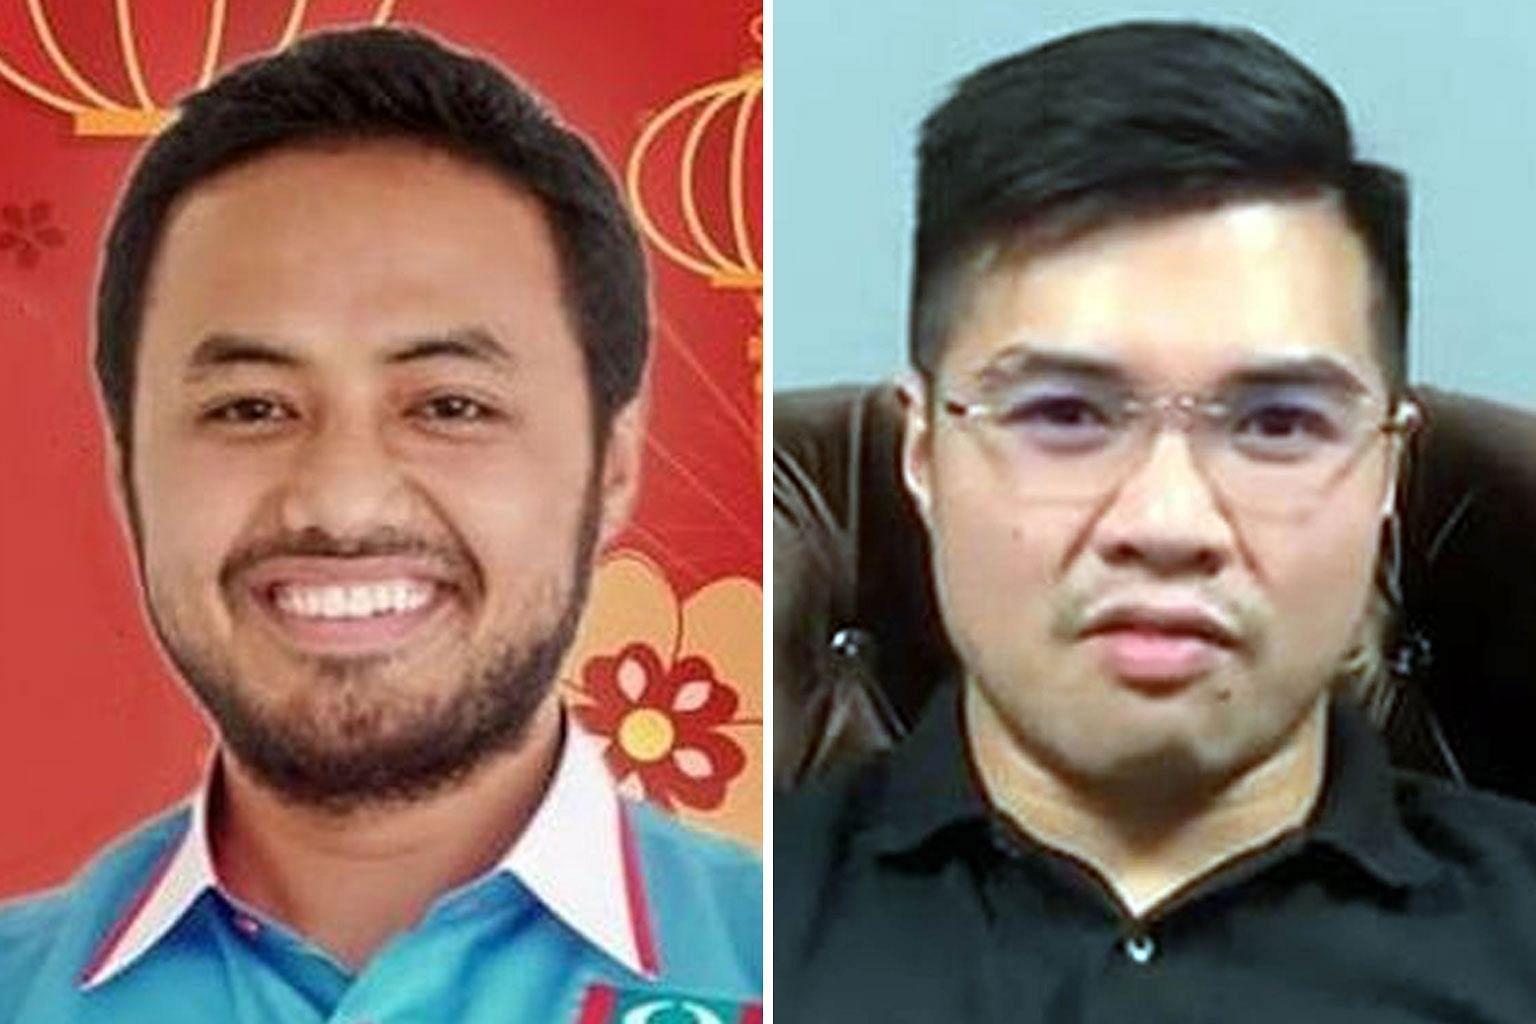 KES VIDEO SEKS MALAYSIA Setiausaha Politik Anwar ditangkap bersama dua suspek lain di Johor